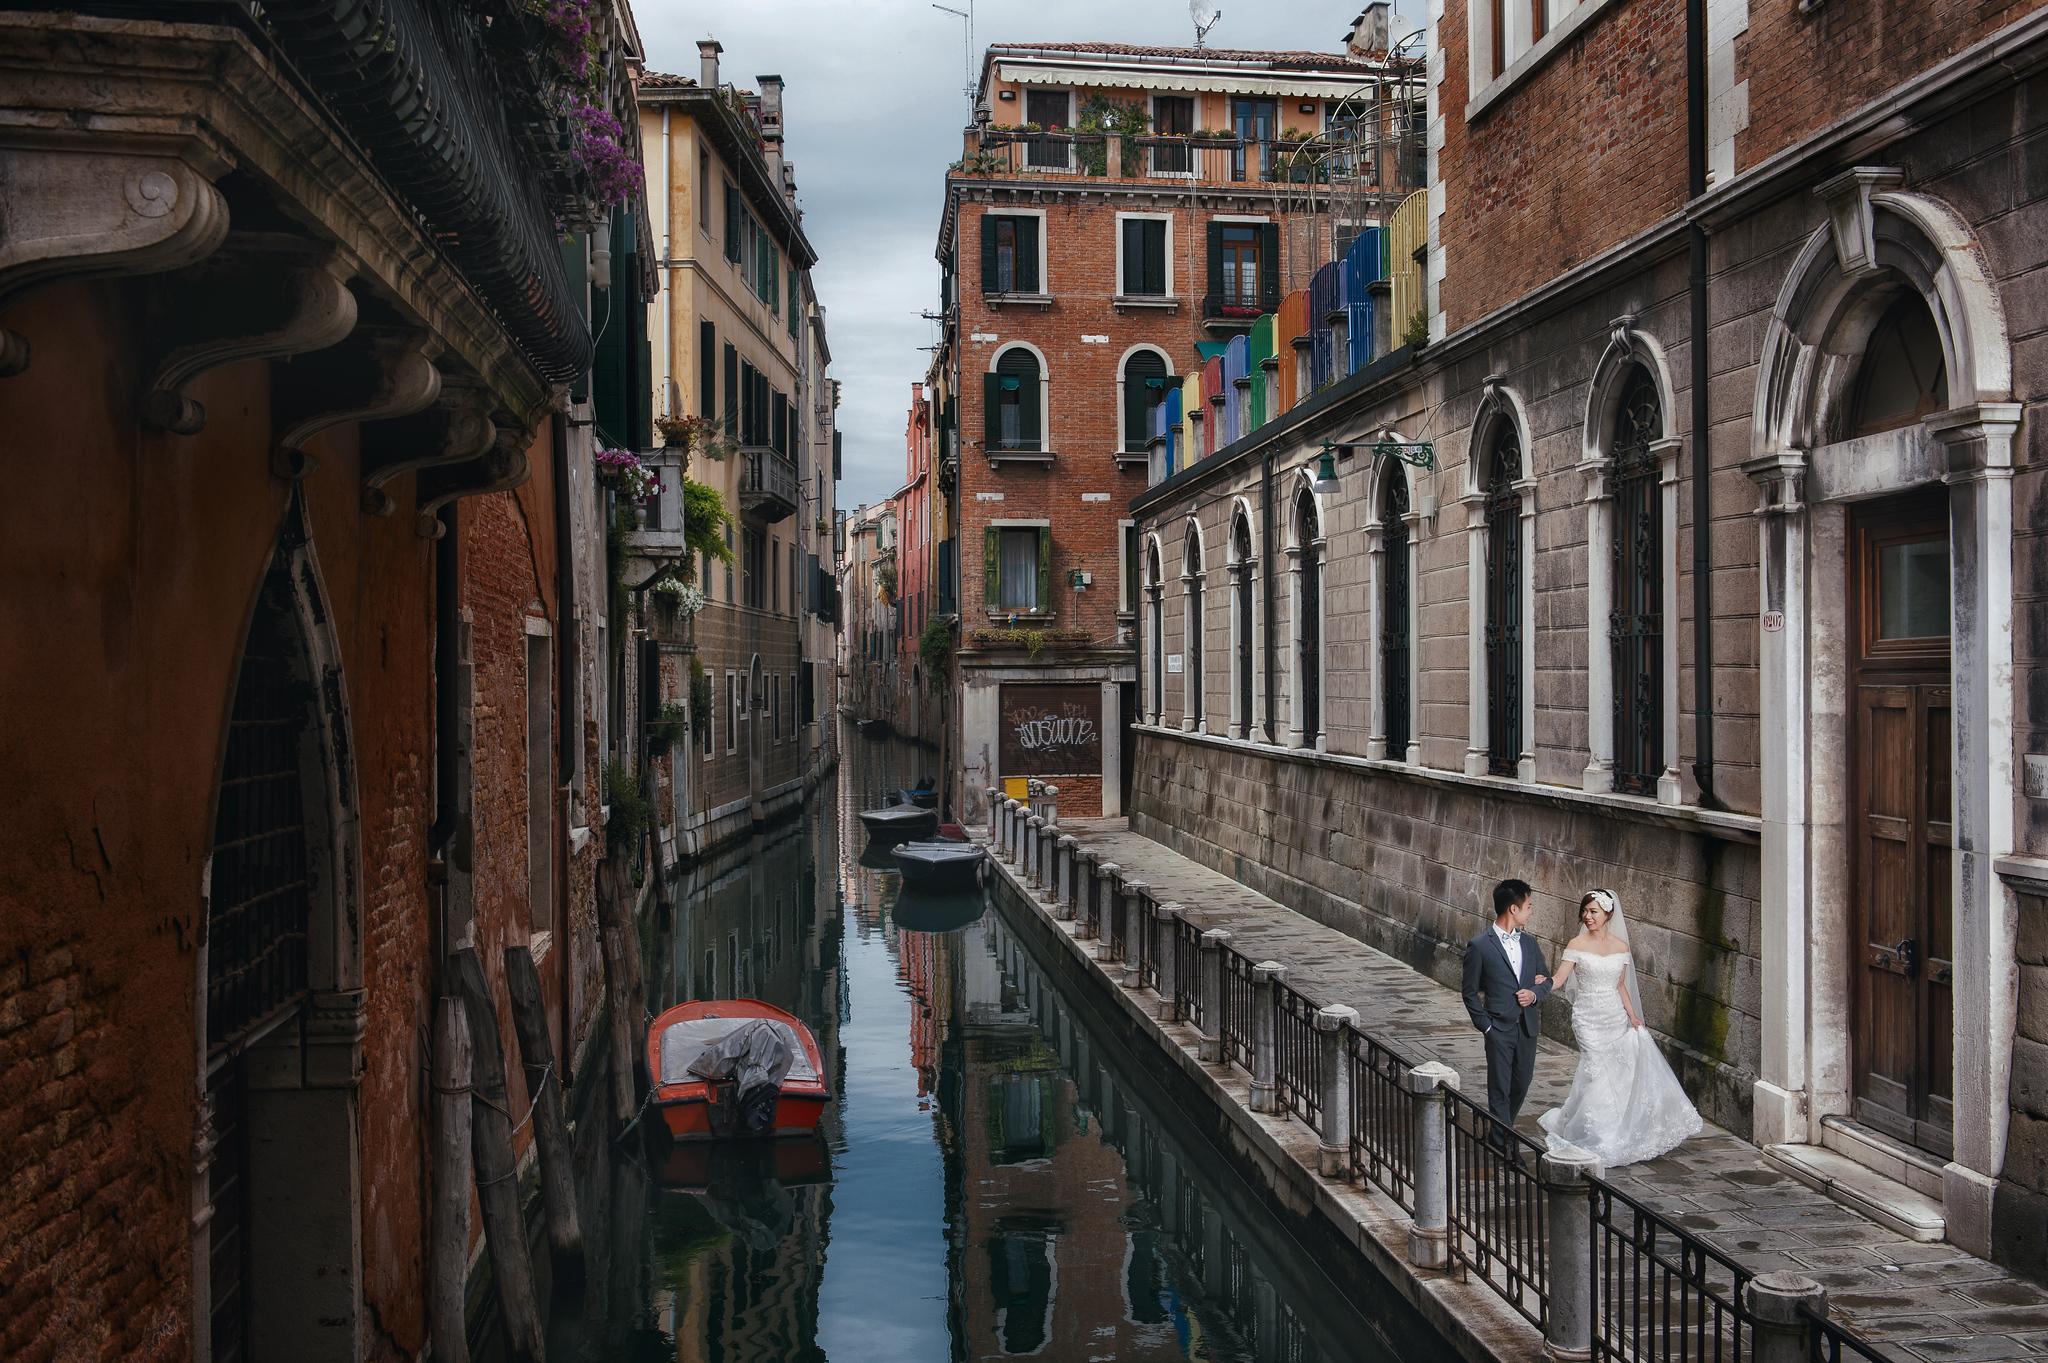 Donfer, 海外婚紗, World tour, 東法, EASTERN WEDDING, 世界旅拍, Venice, 威尼斯, 威尼斯婚紗